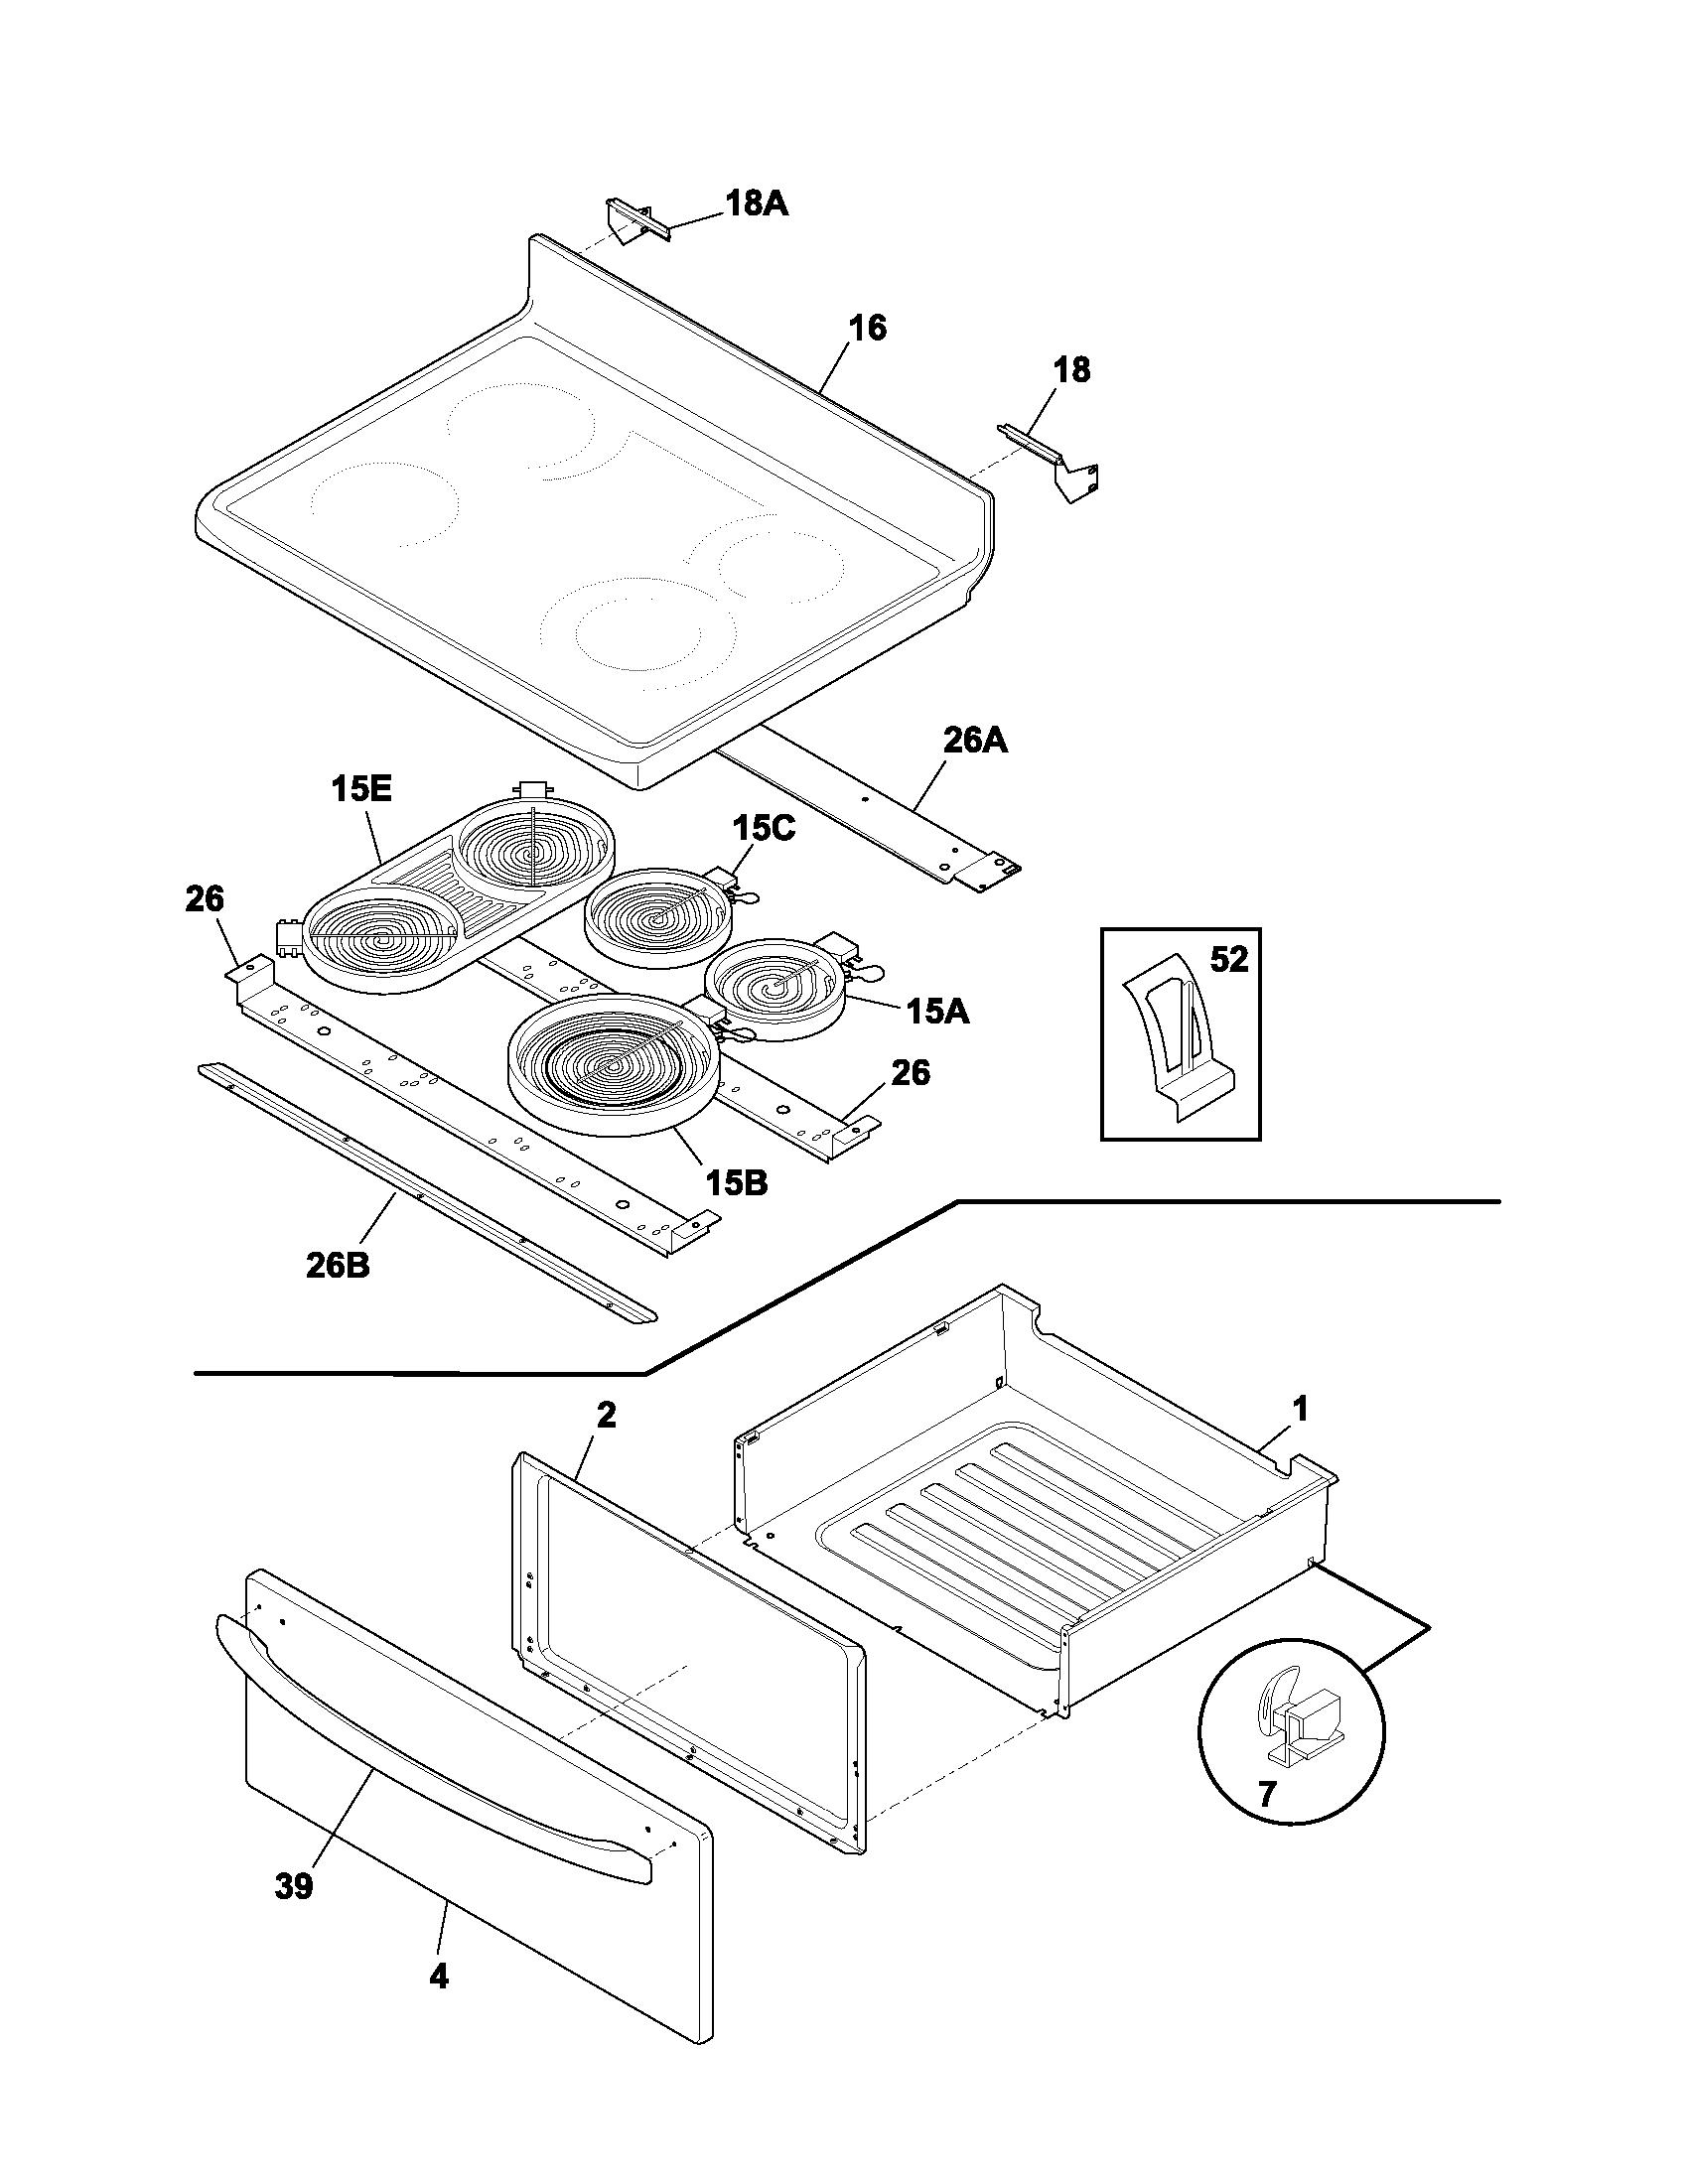 wiring diagrams besides jenn air range wiring diagram on whirlpool